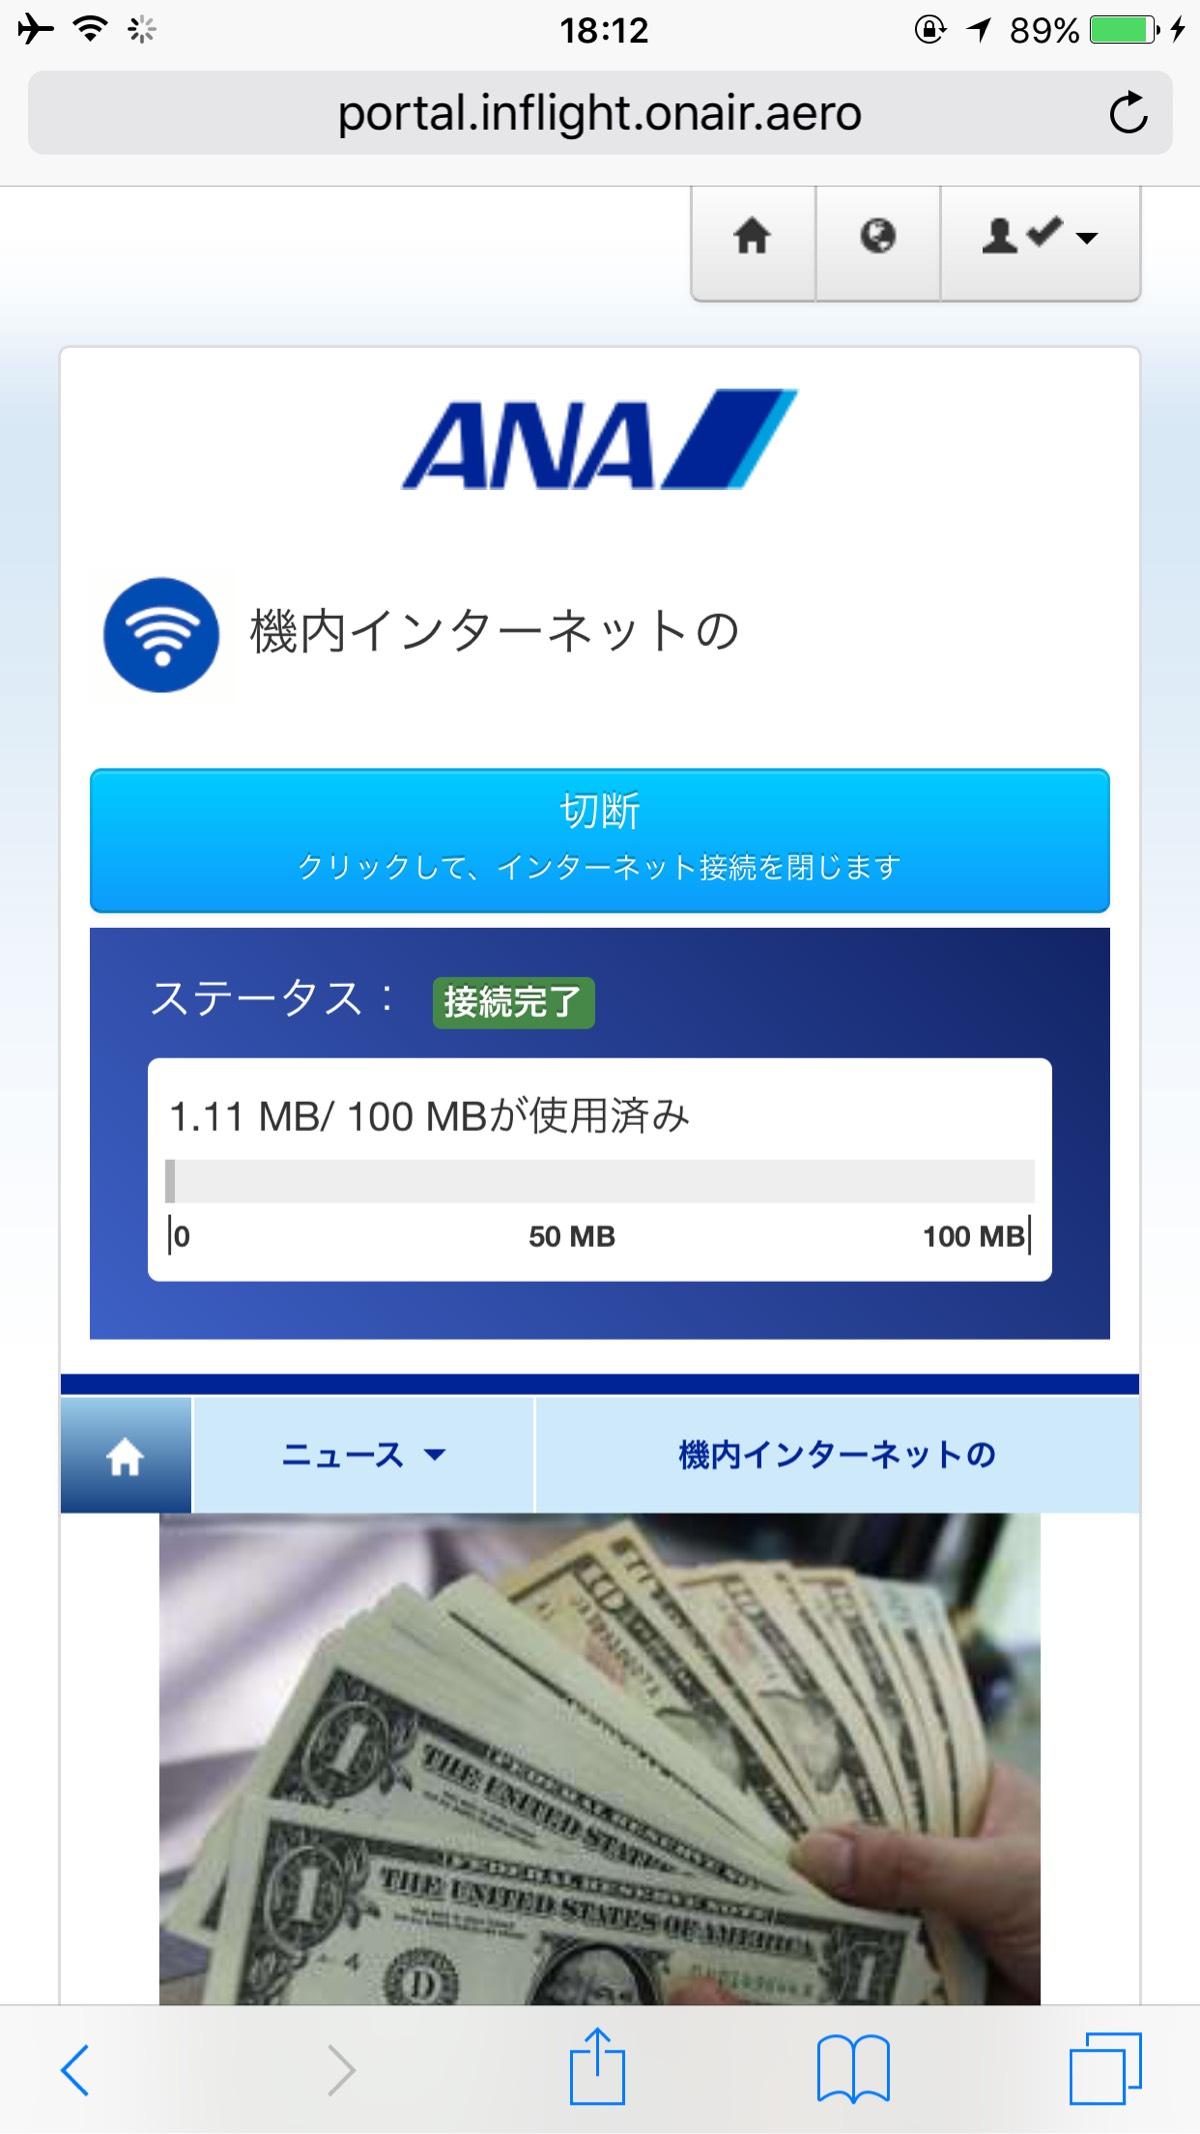 ANAの機内インターネットサービス(ANA WiFi Service)を使って空からブログを更新してみる!